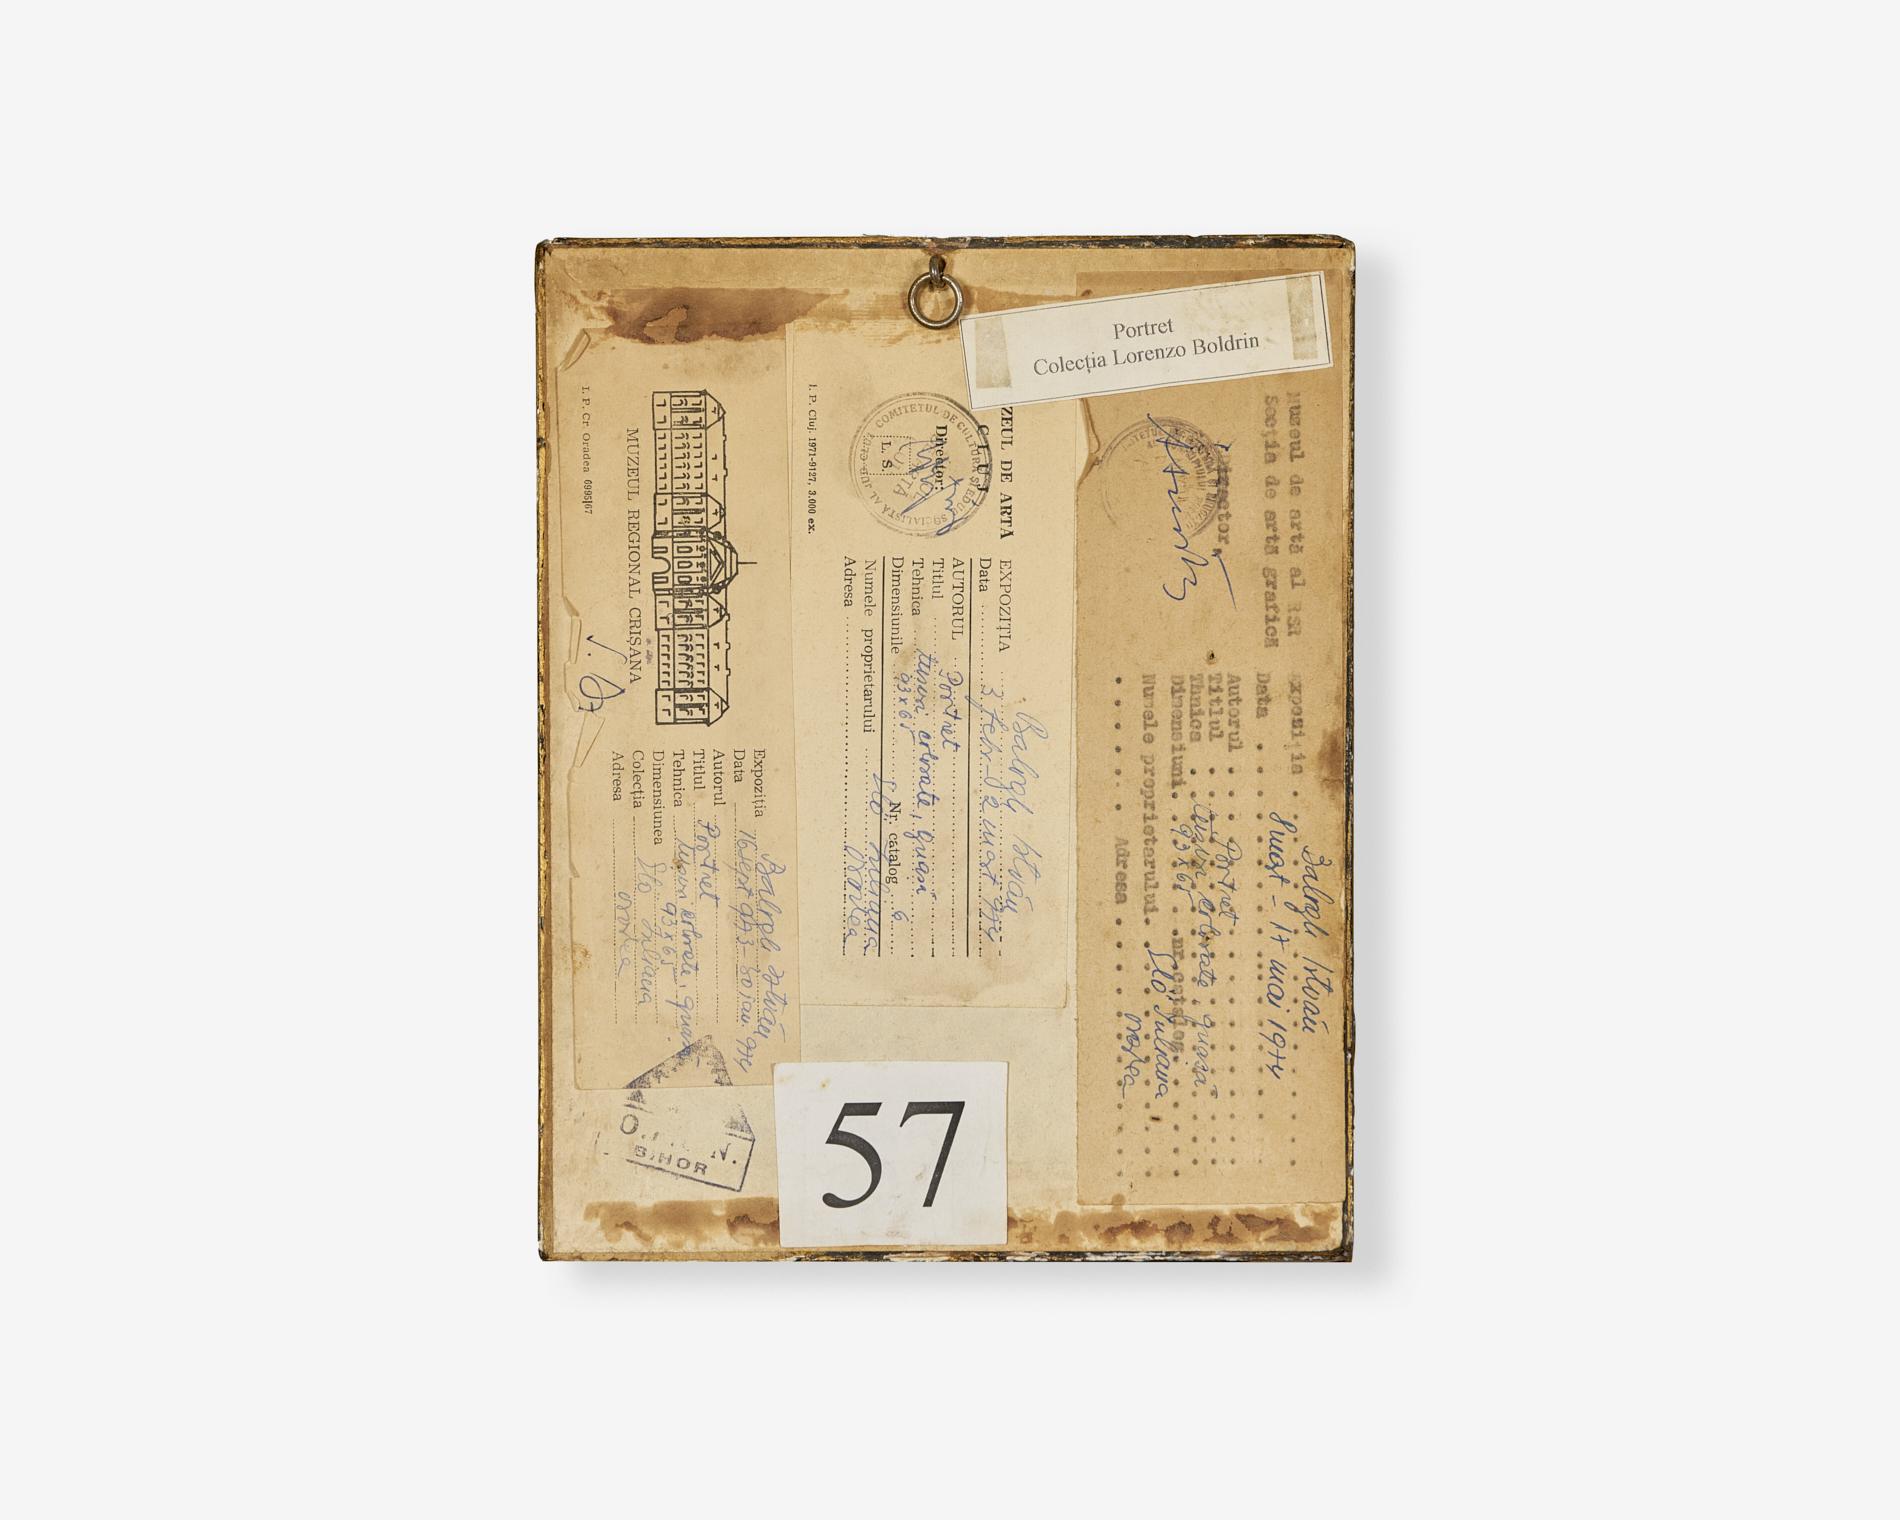 Istvan-Valog0583faraci-arte-verona-galleria-arte-moderna